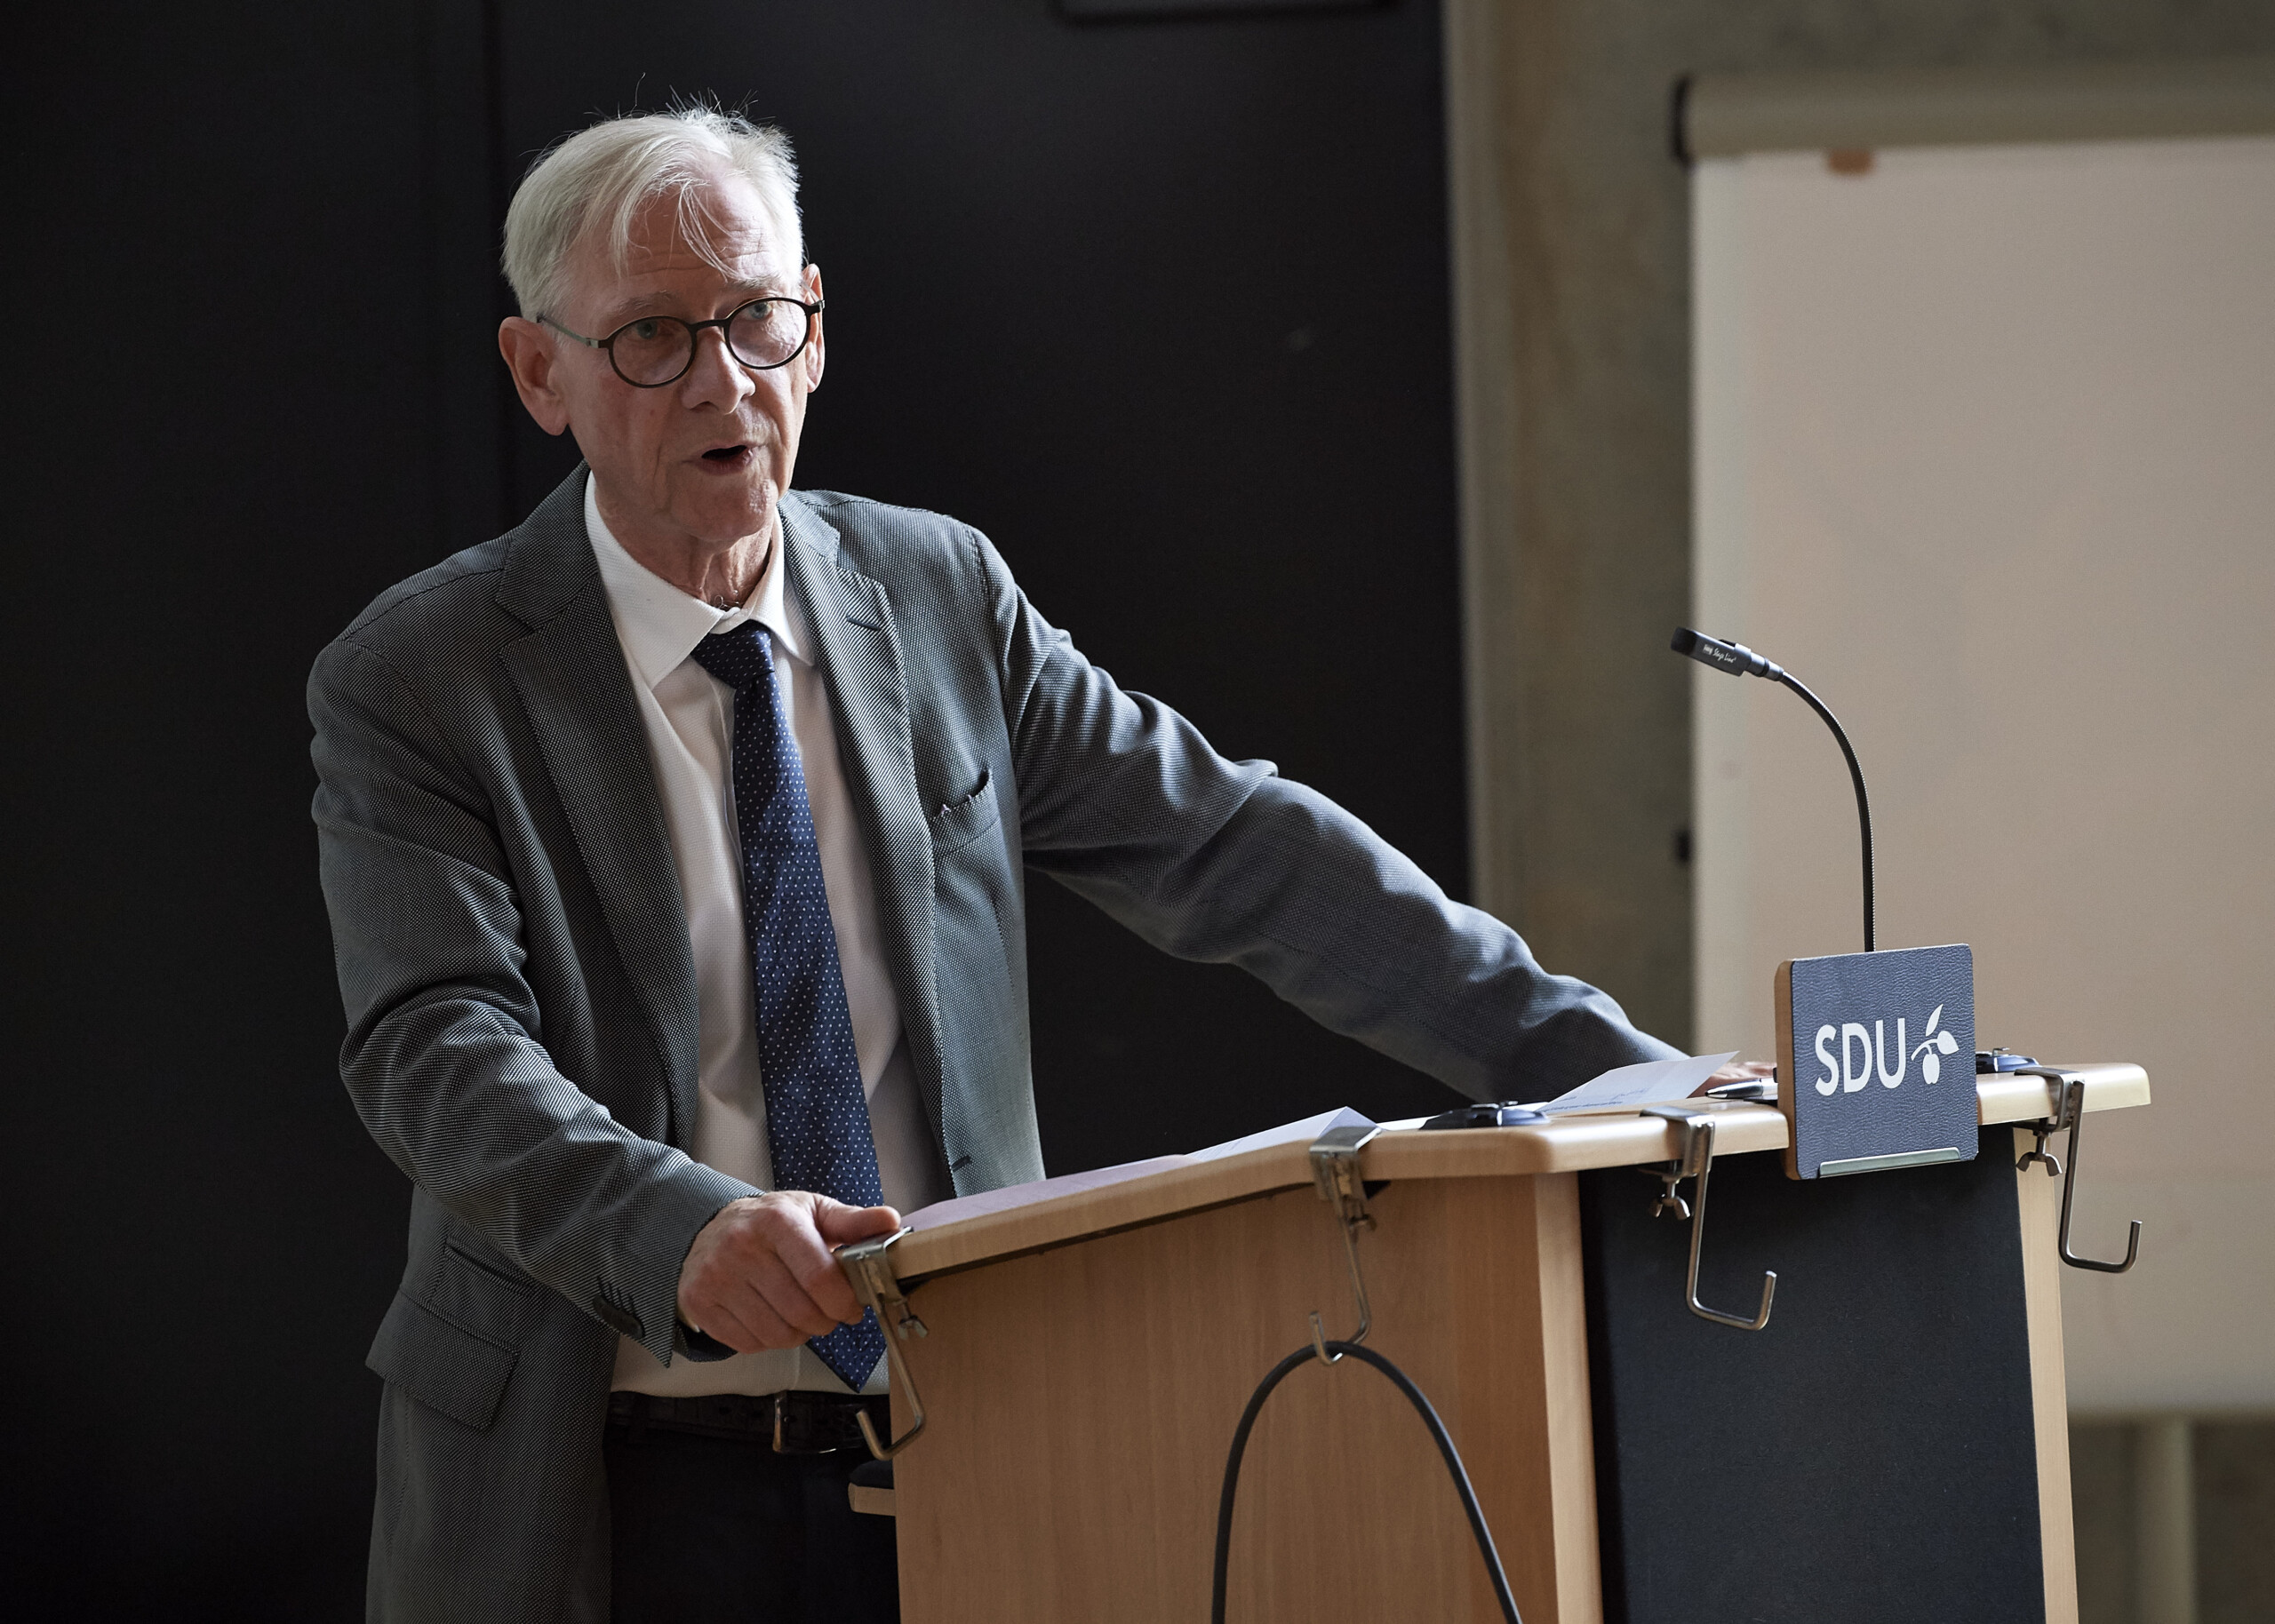 Kurt Klaudi Klausen